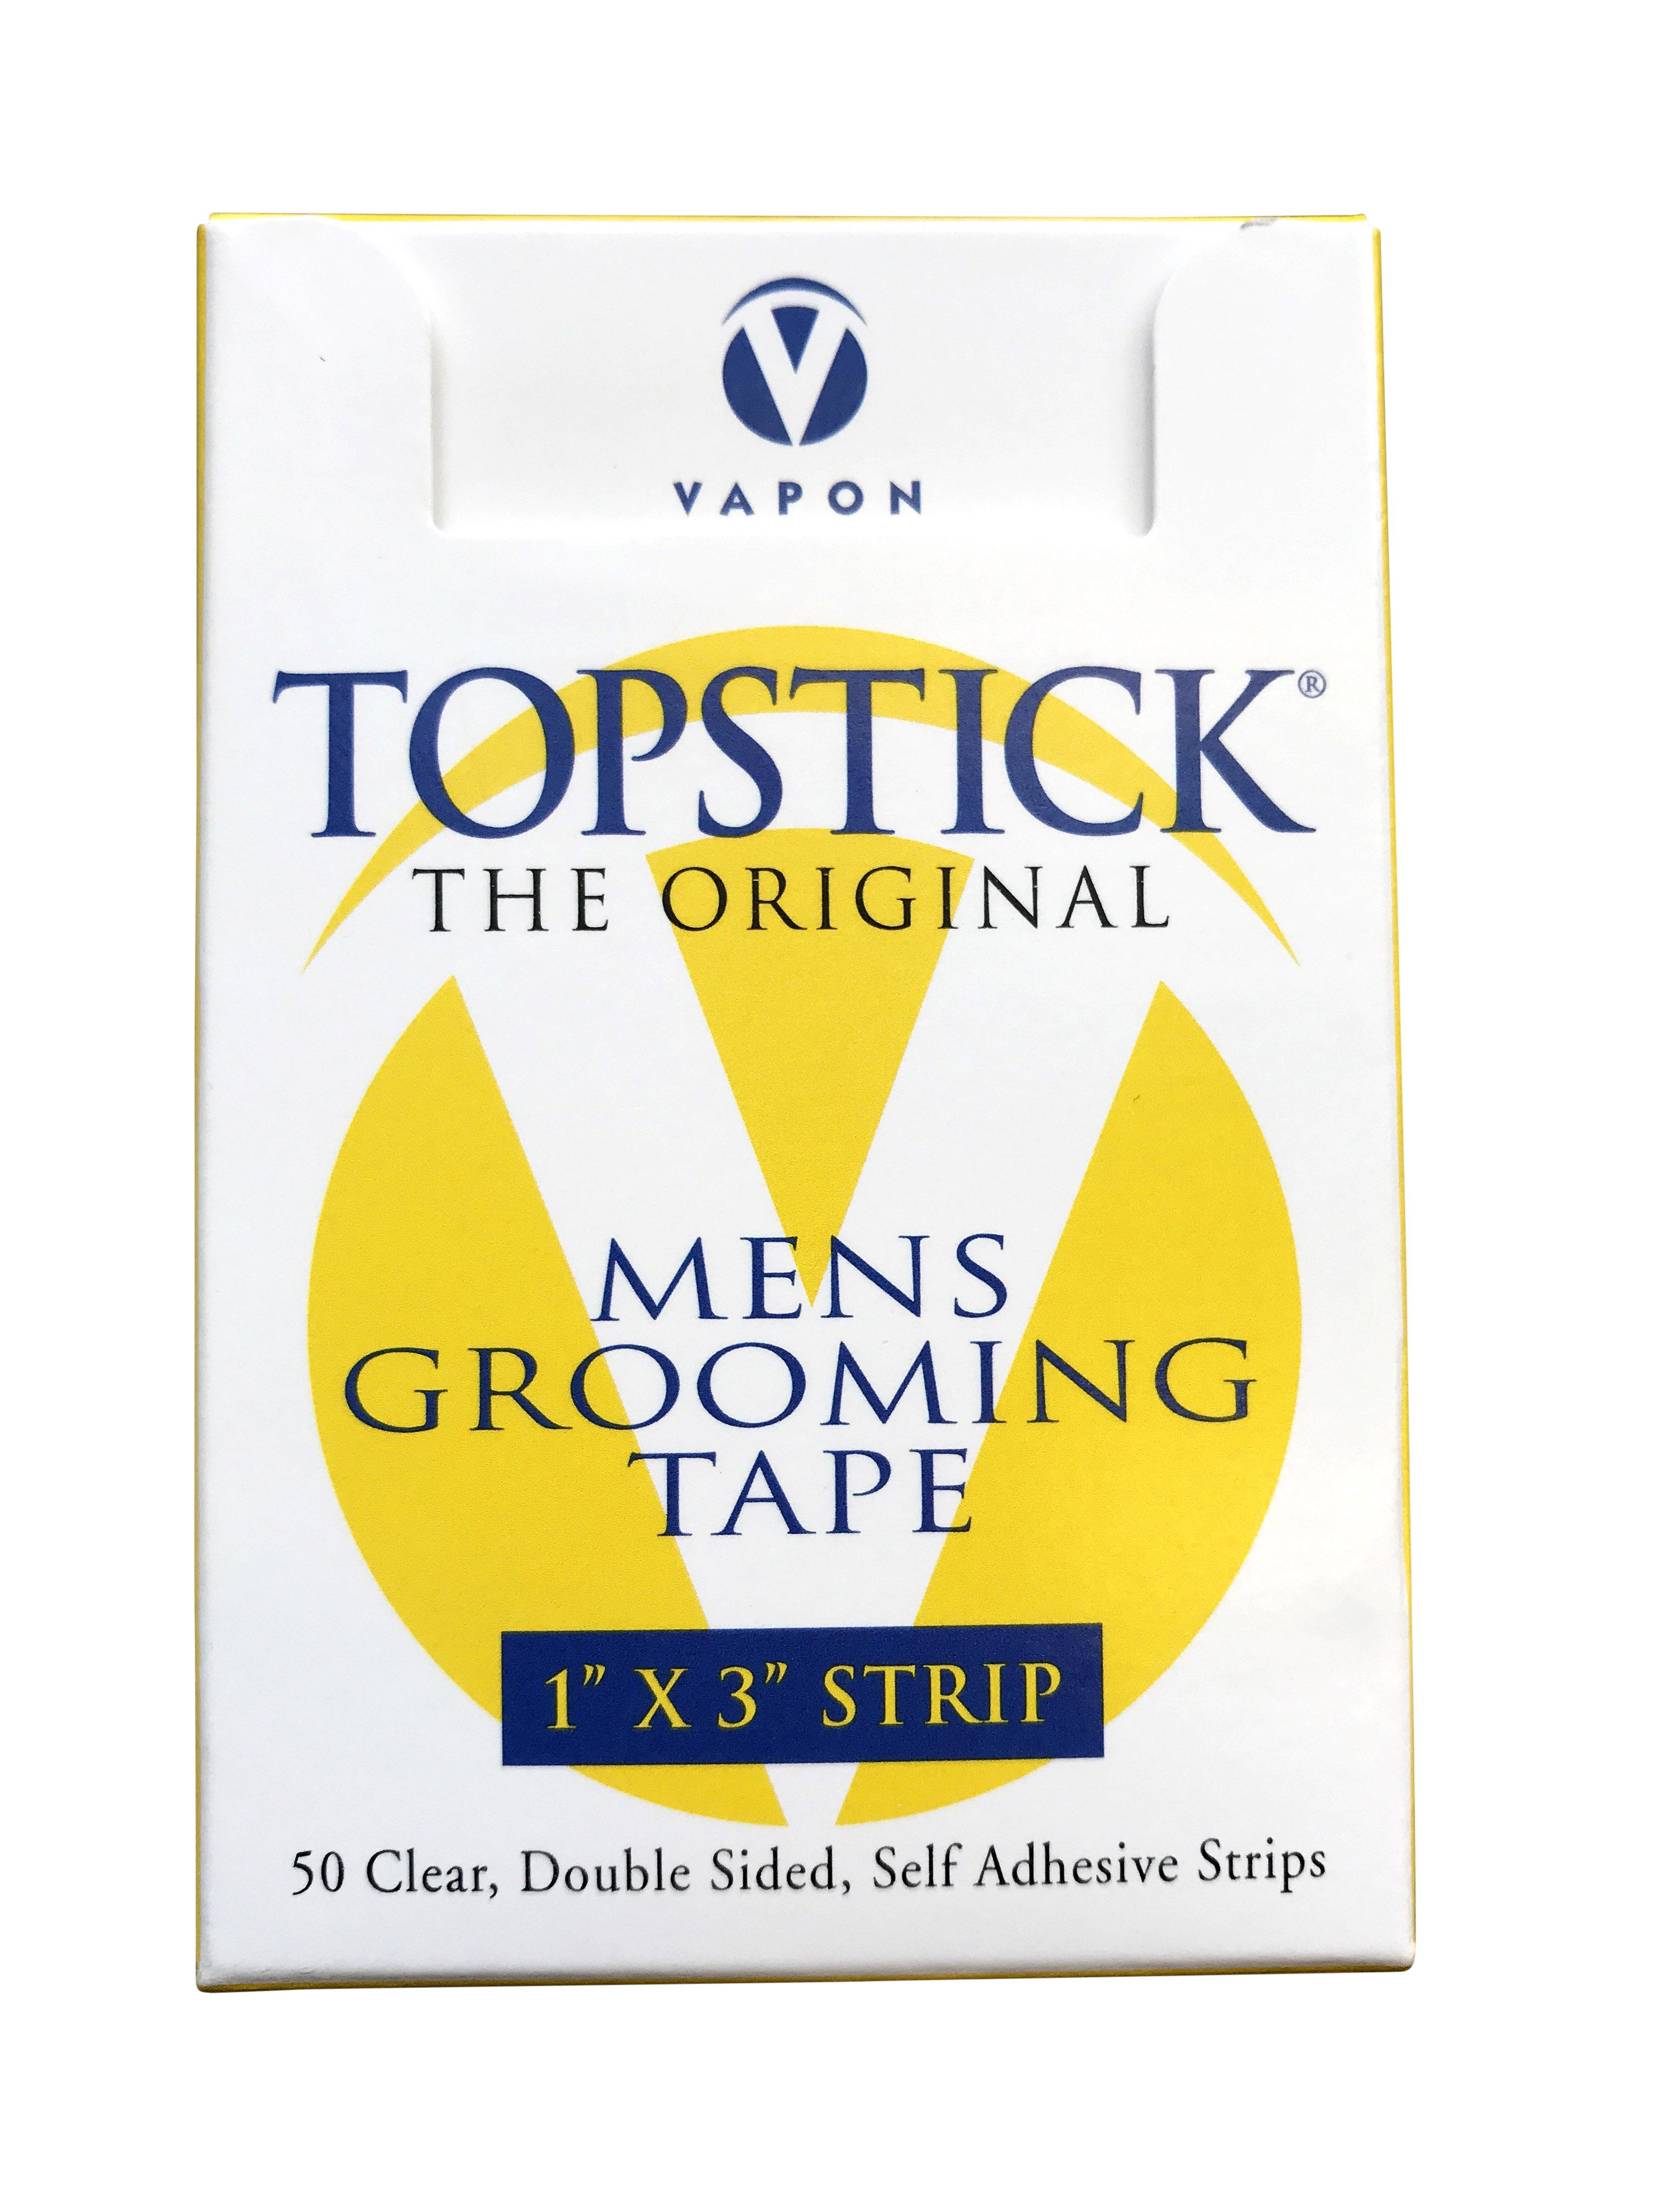 Topstick Mens Grooming Tape, soluciones, moda